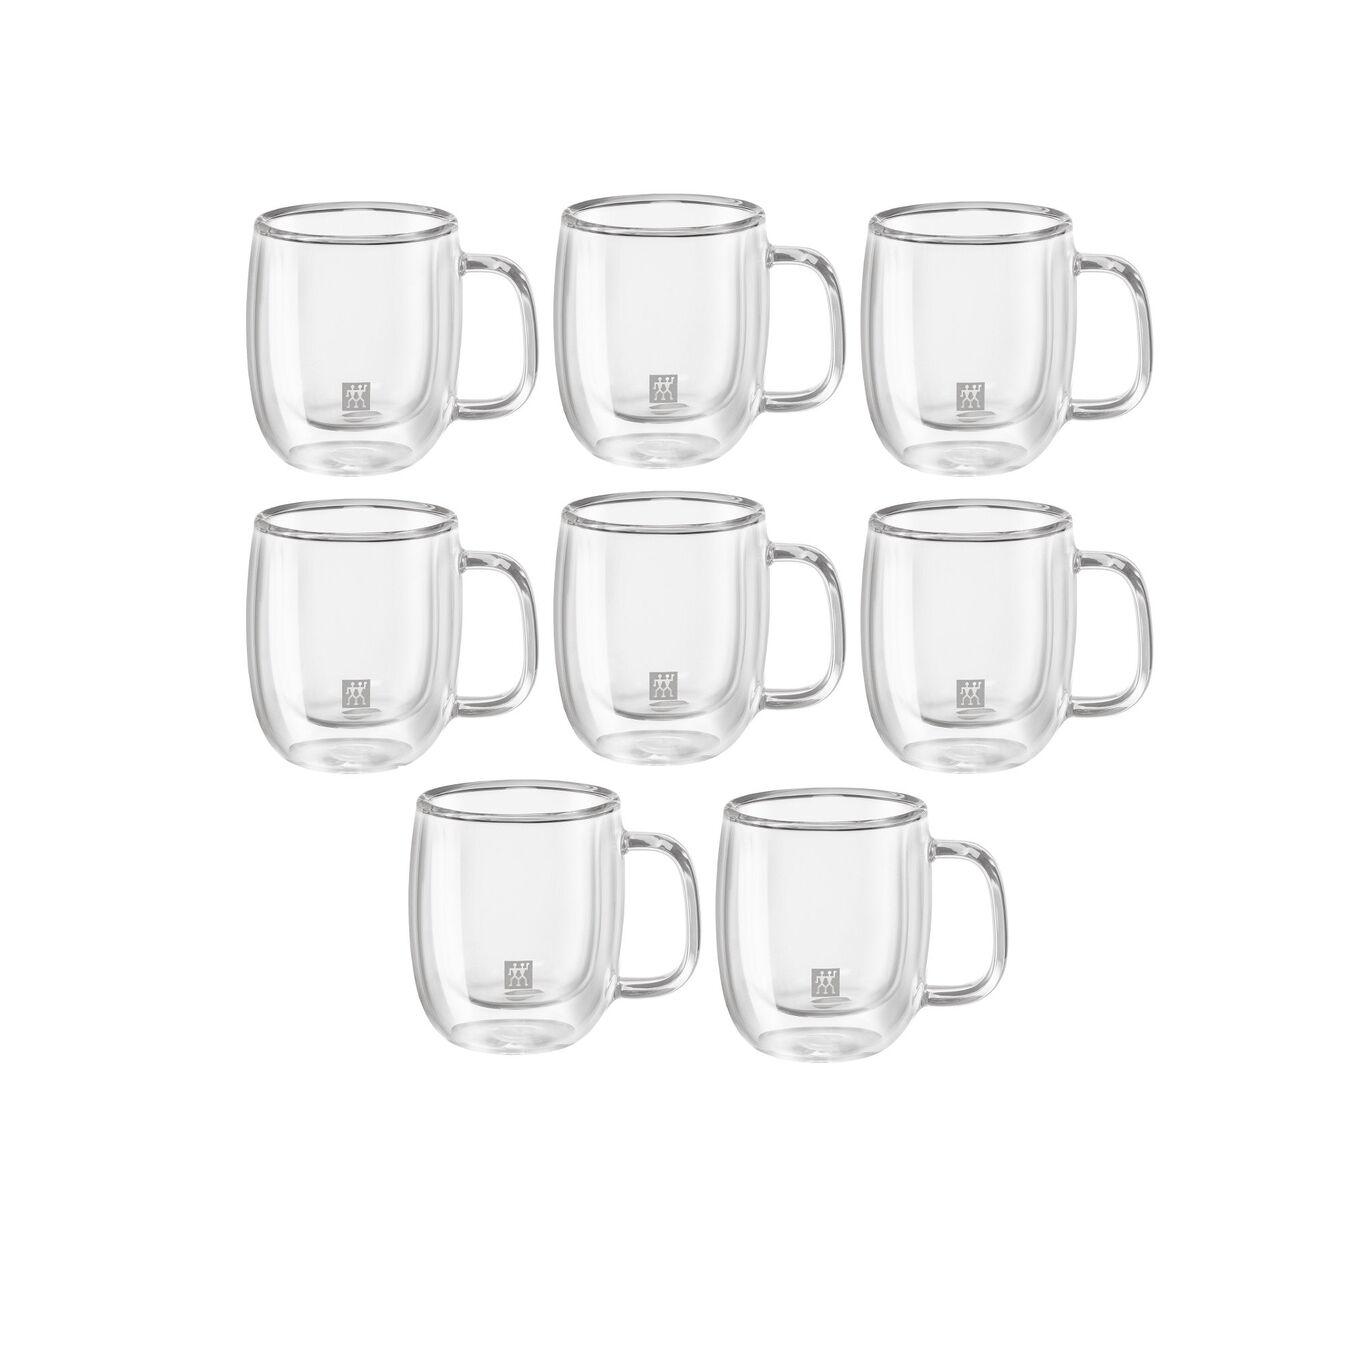 8 Piece Espresso Mug Set - Value Pack,,large 1